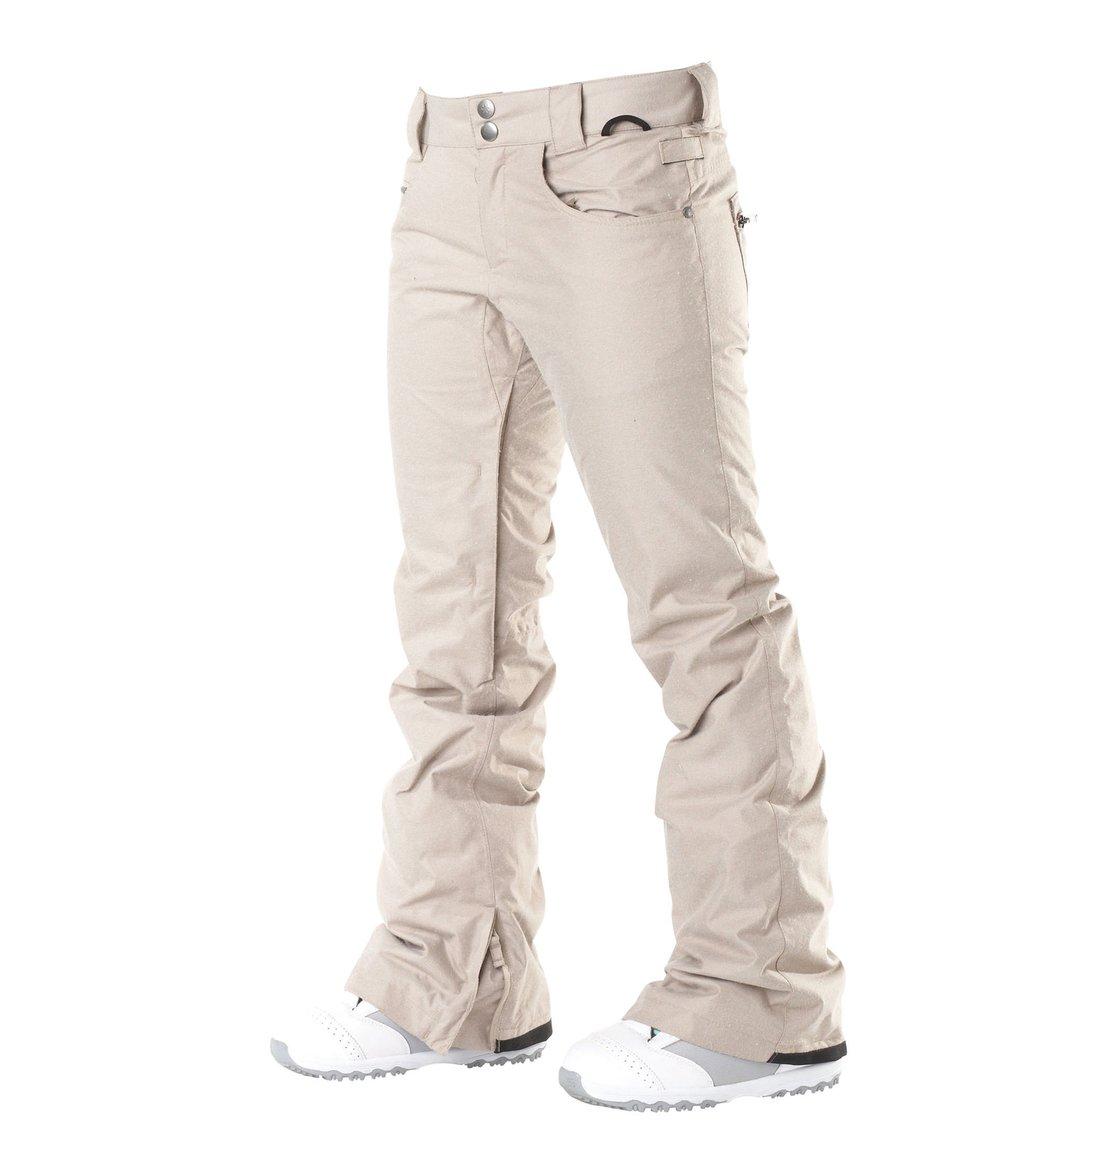 7a46fb357 Women's Viva Snowboard Pants 64601094   DC Shoes